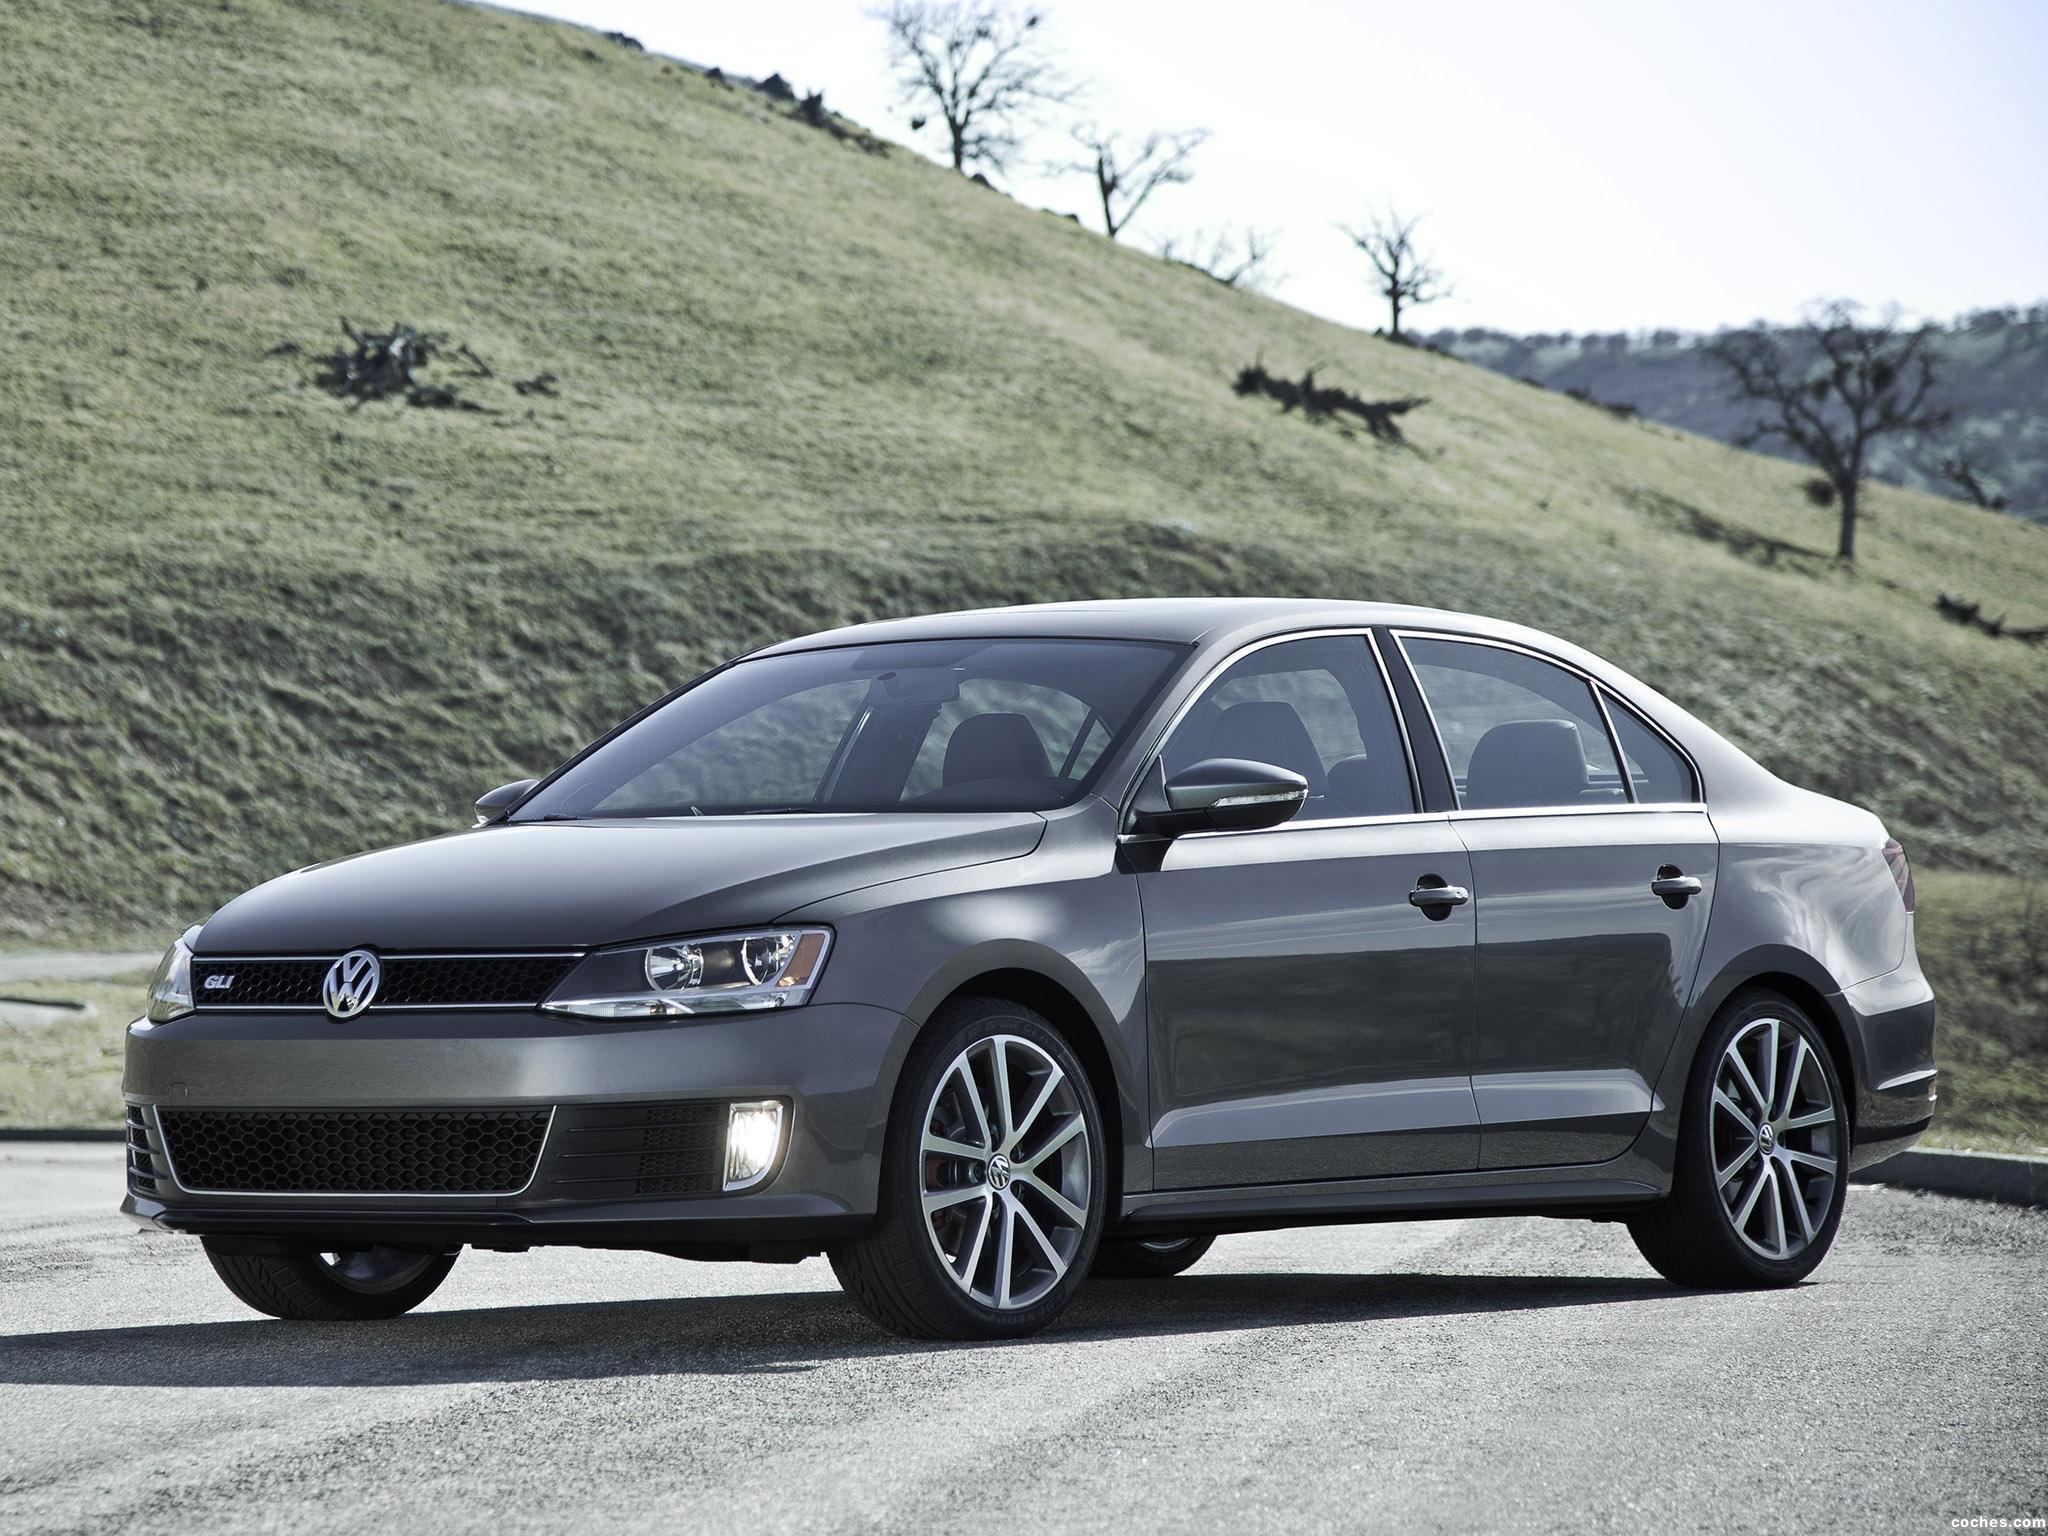 Carros Usados Volkswagen Jetta Demotorescomco Autos Weblog